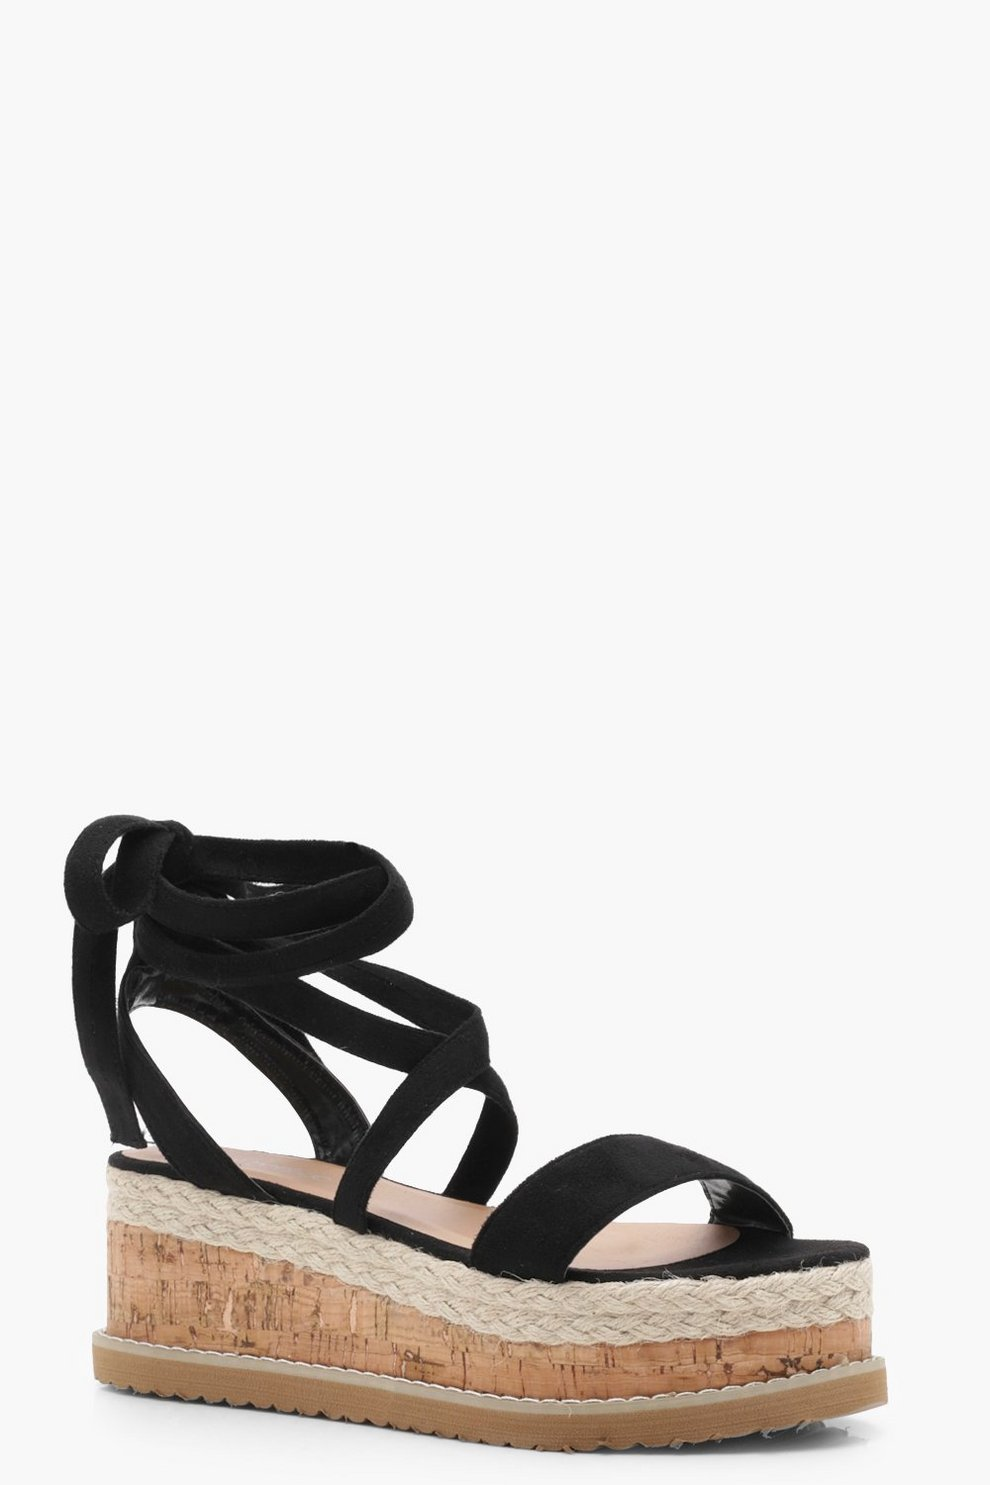 4a9f098a28020 Flatform Espadrille Tie Up Sandals